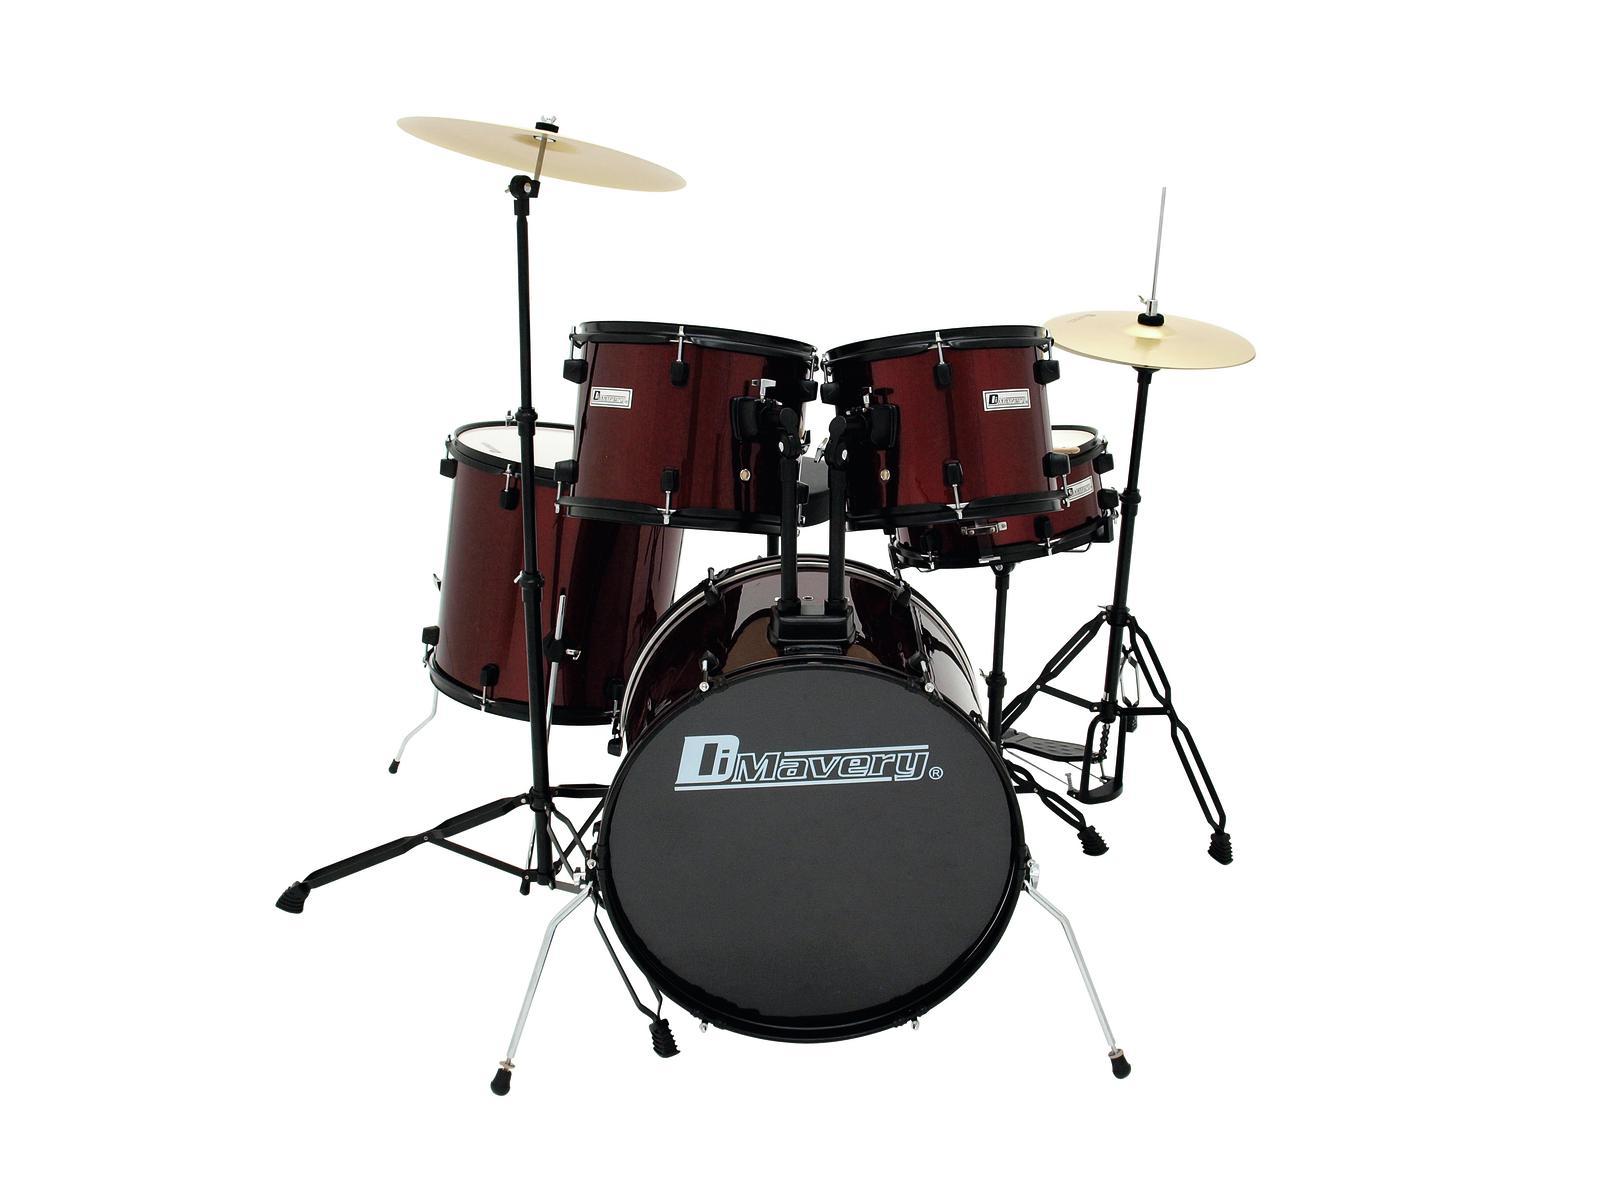 DiMavery DS-200 Trommesæt, Rød